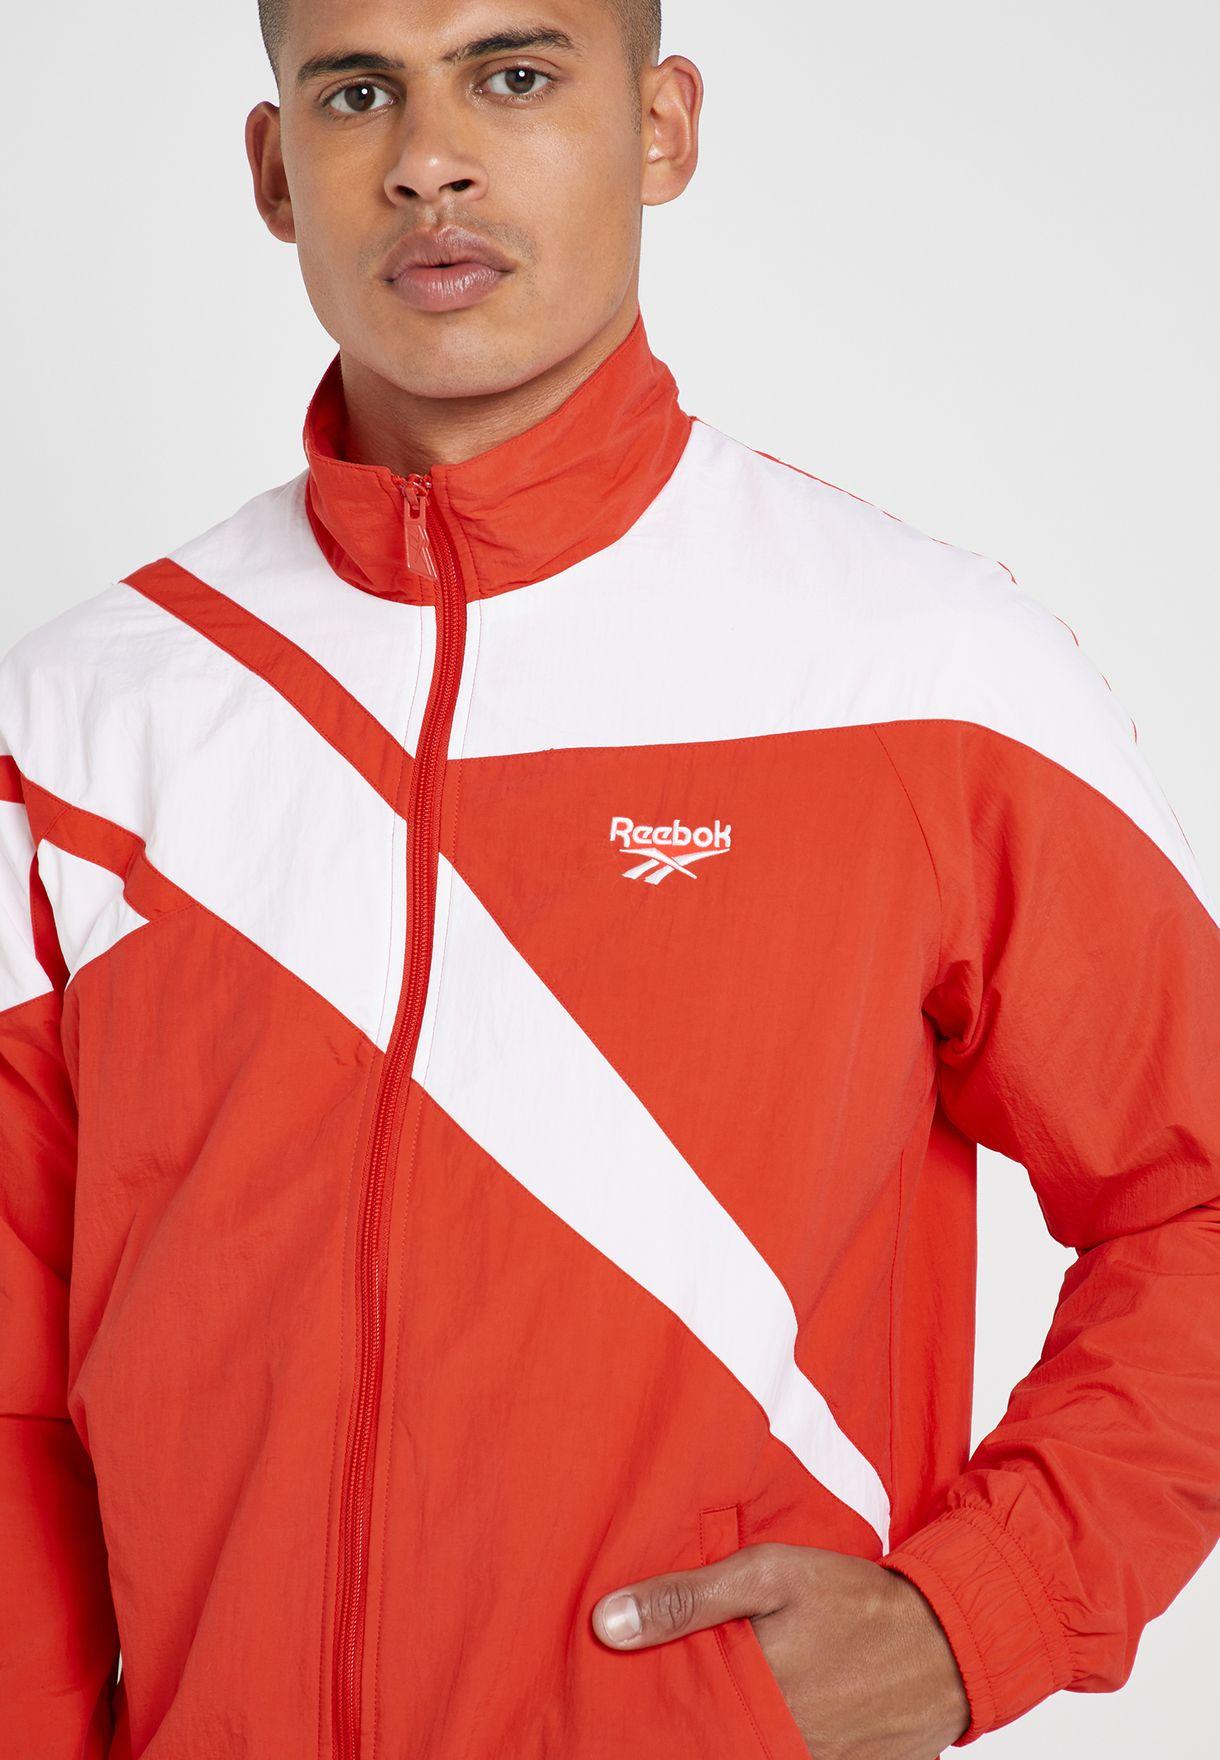 391b7c58ac9 Shop Reebok red Archive Vector Track Jacket EC5781 for Men in Saudi ...